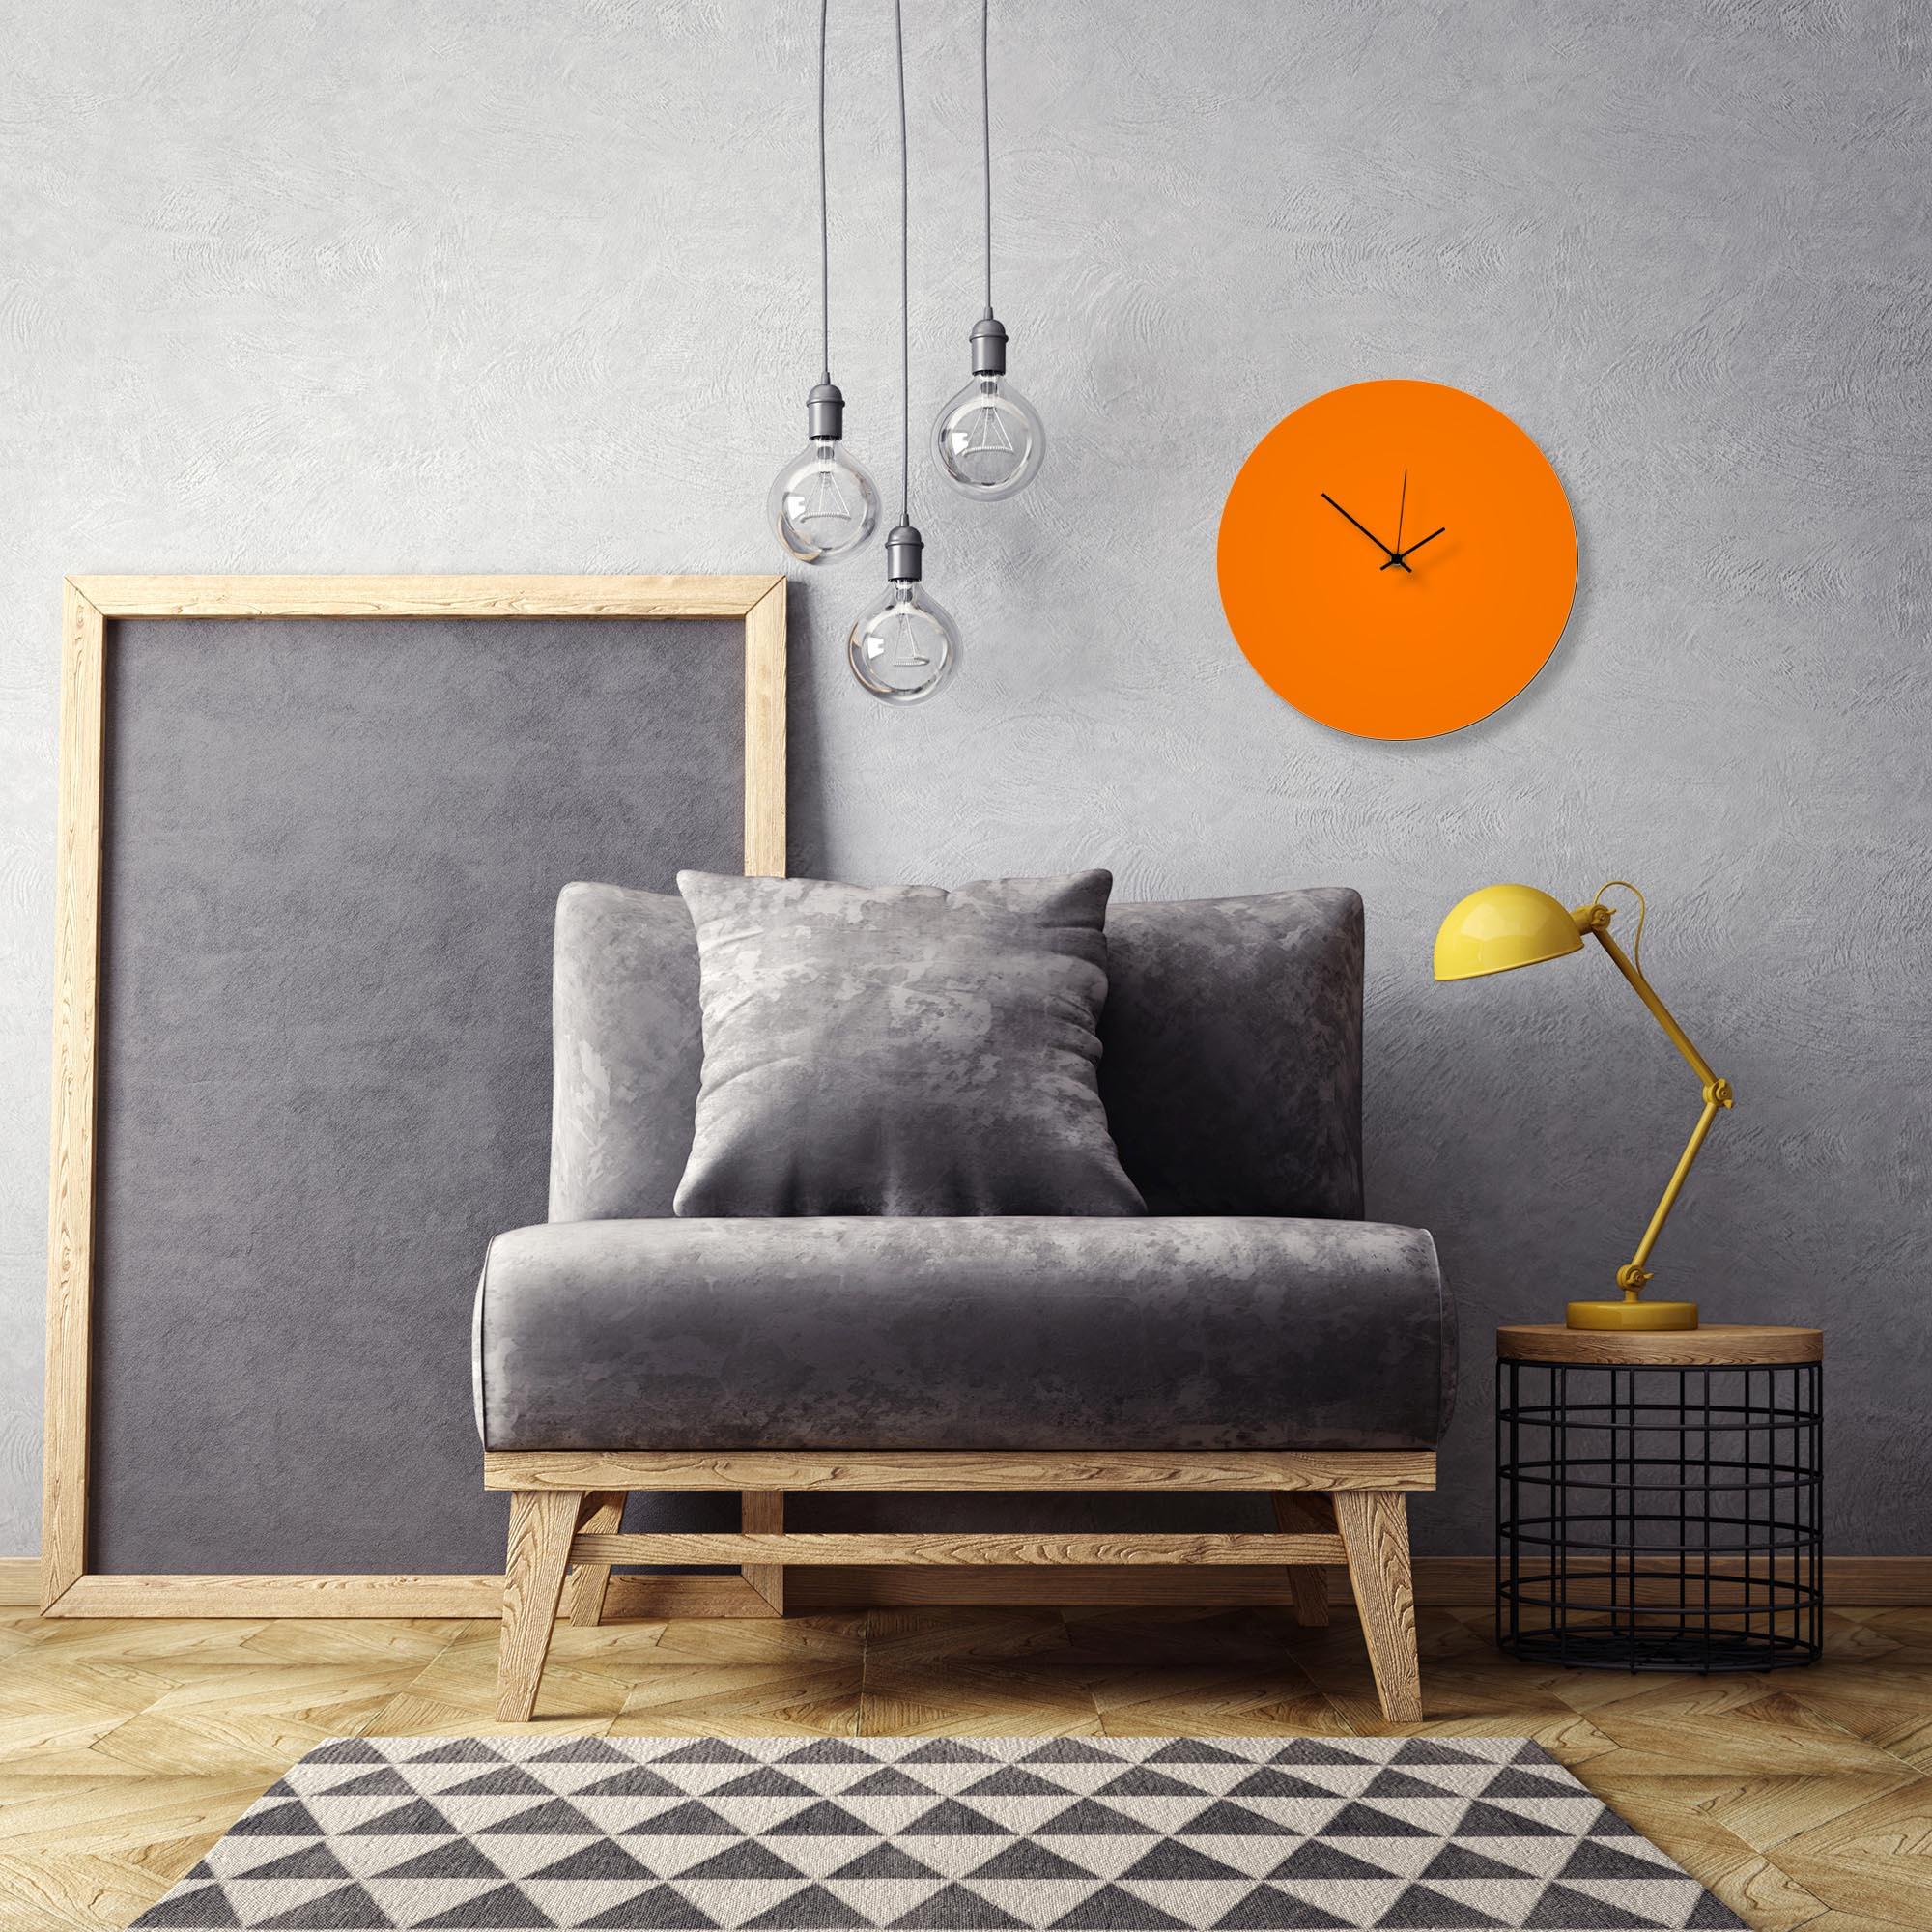 Orangeout Black Circle Clock by Adam Schwoeppe Contemporary Clock on Aluminum Polymetal - Alternate View 1